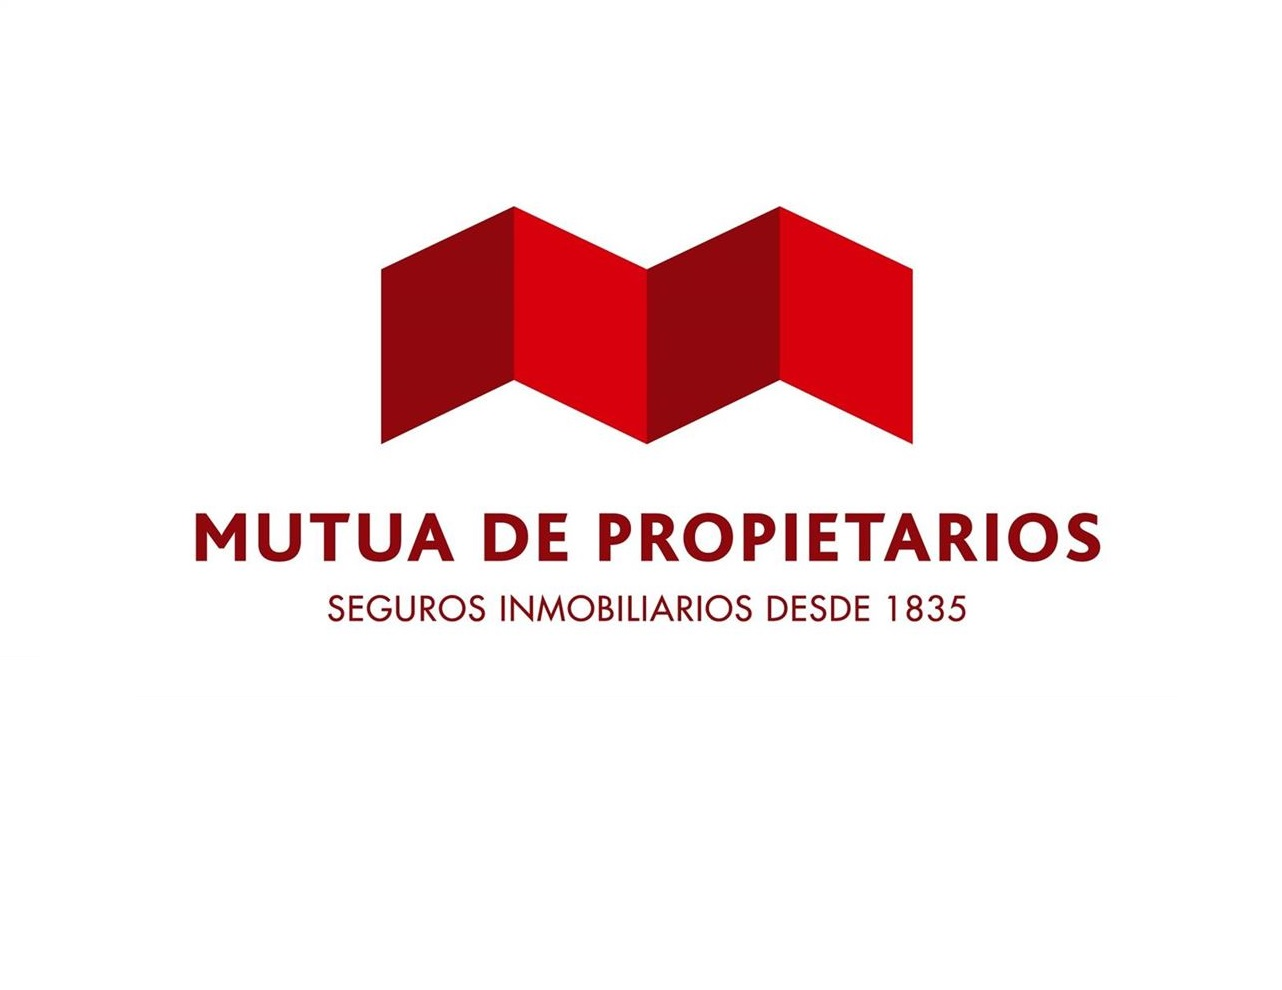 MUTUA-DE-PROPIETARIOS